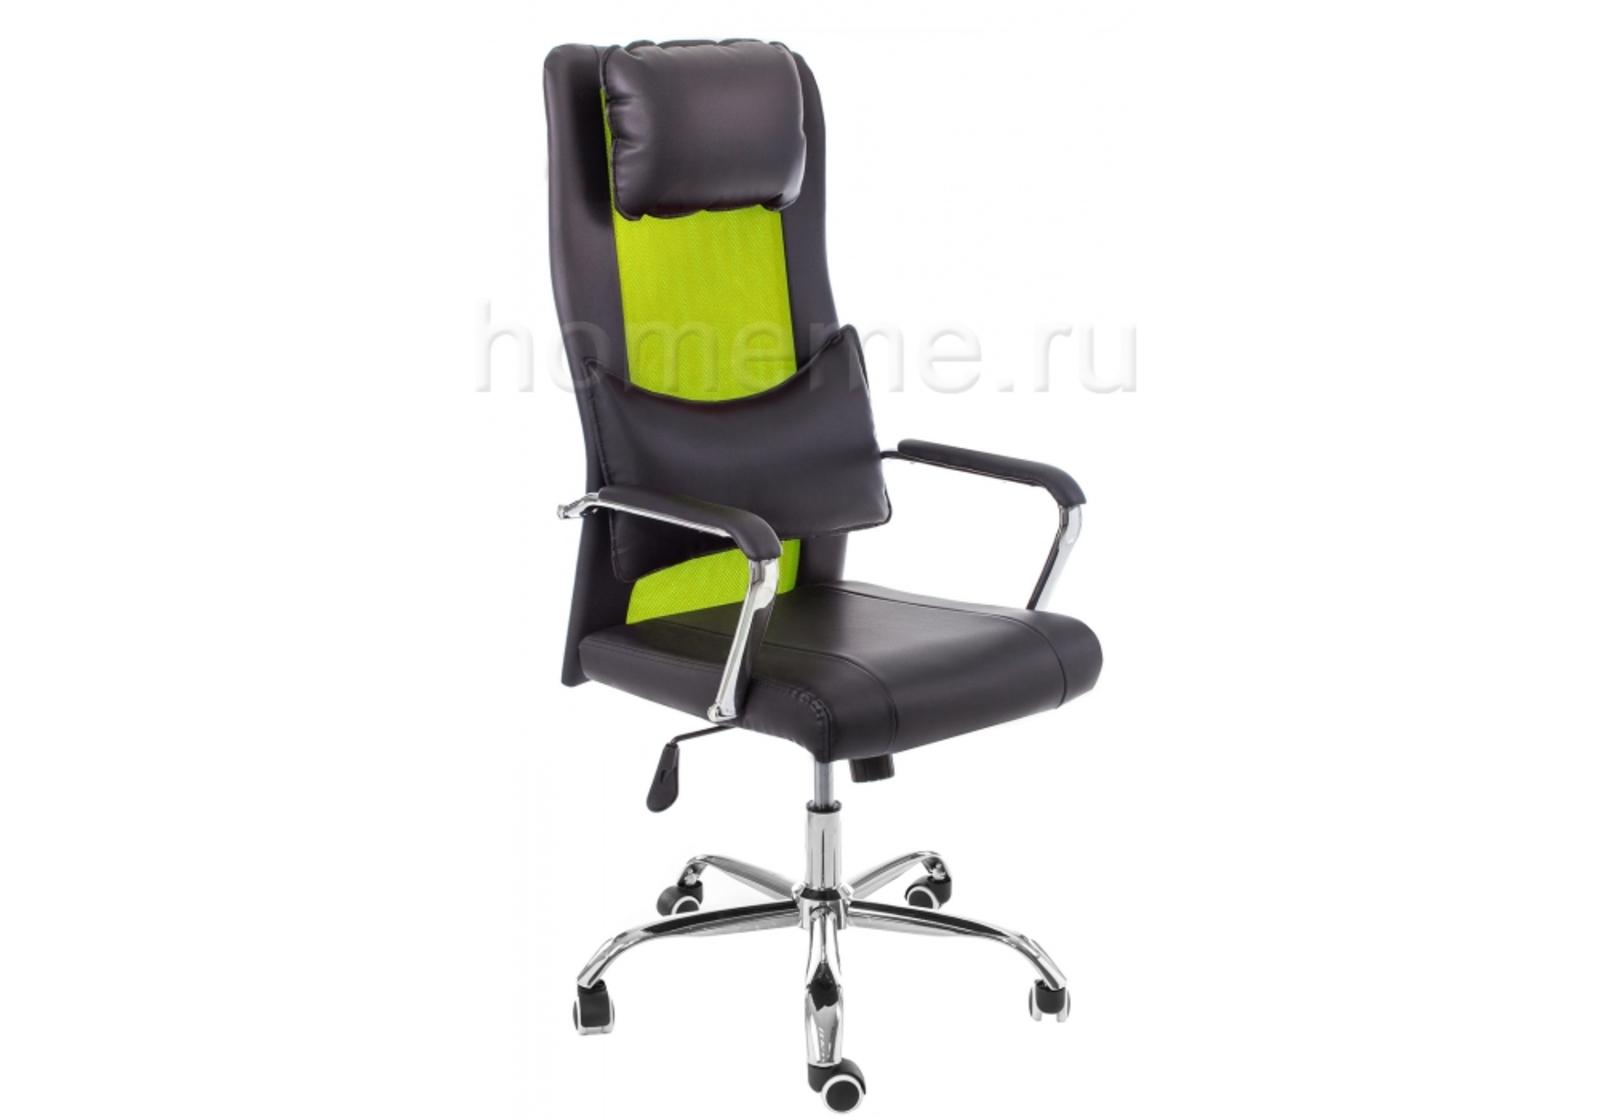 Кресло для офиса HomeMe Компьютерное кресло Unic black / green 11053 от Homeme.ru